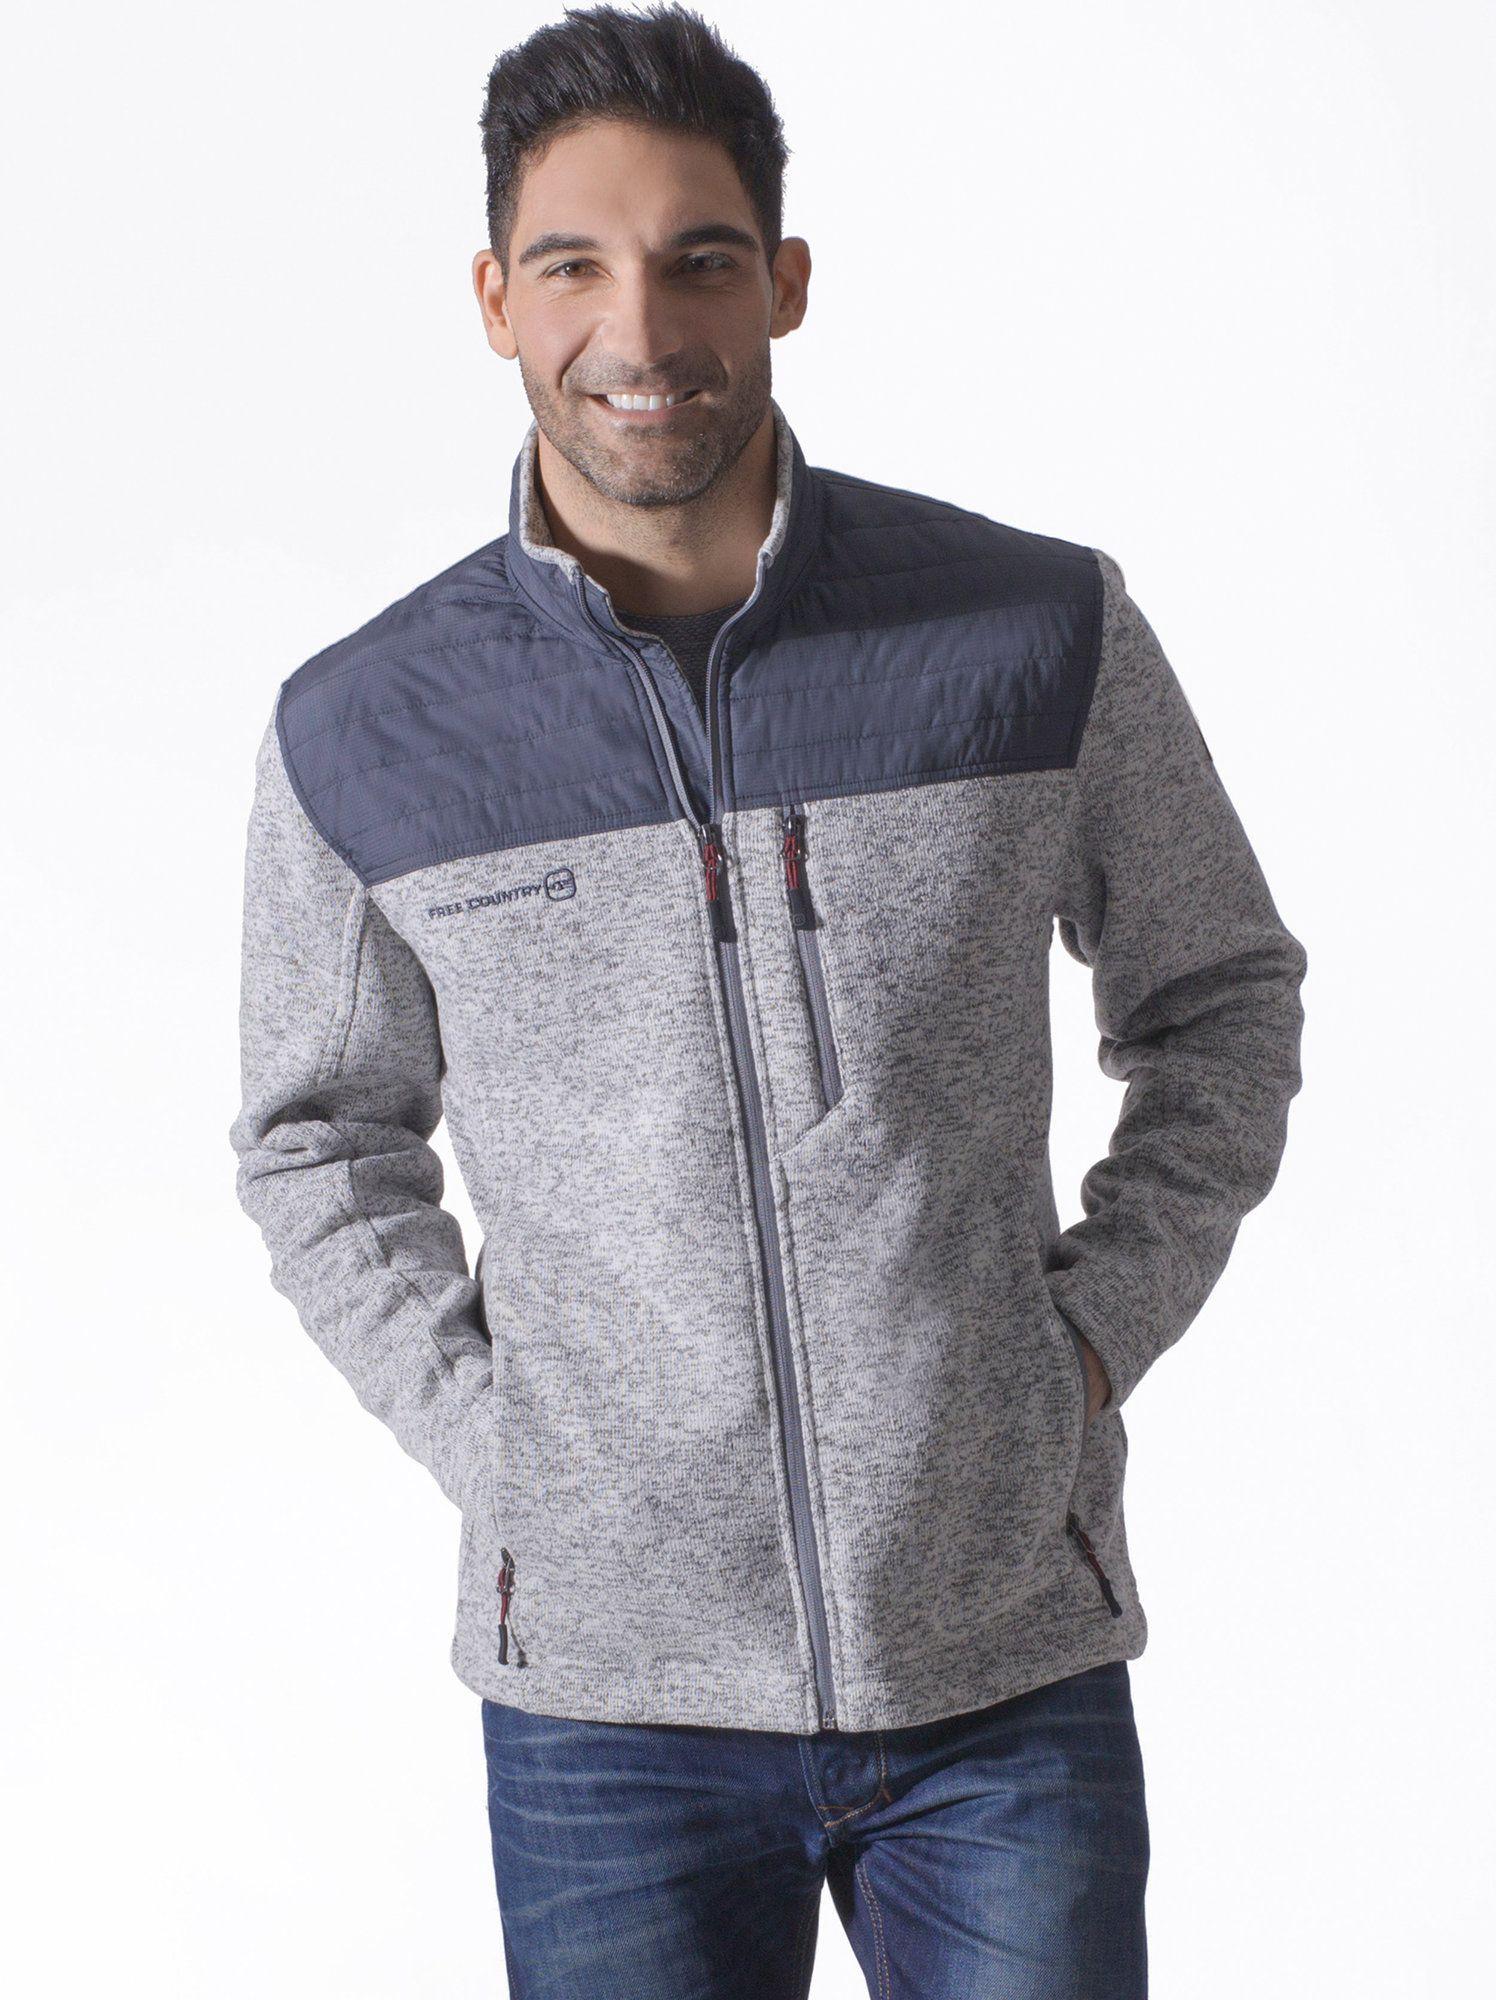 Men's Frore Sweater Knit Fleece - Free Country